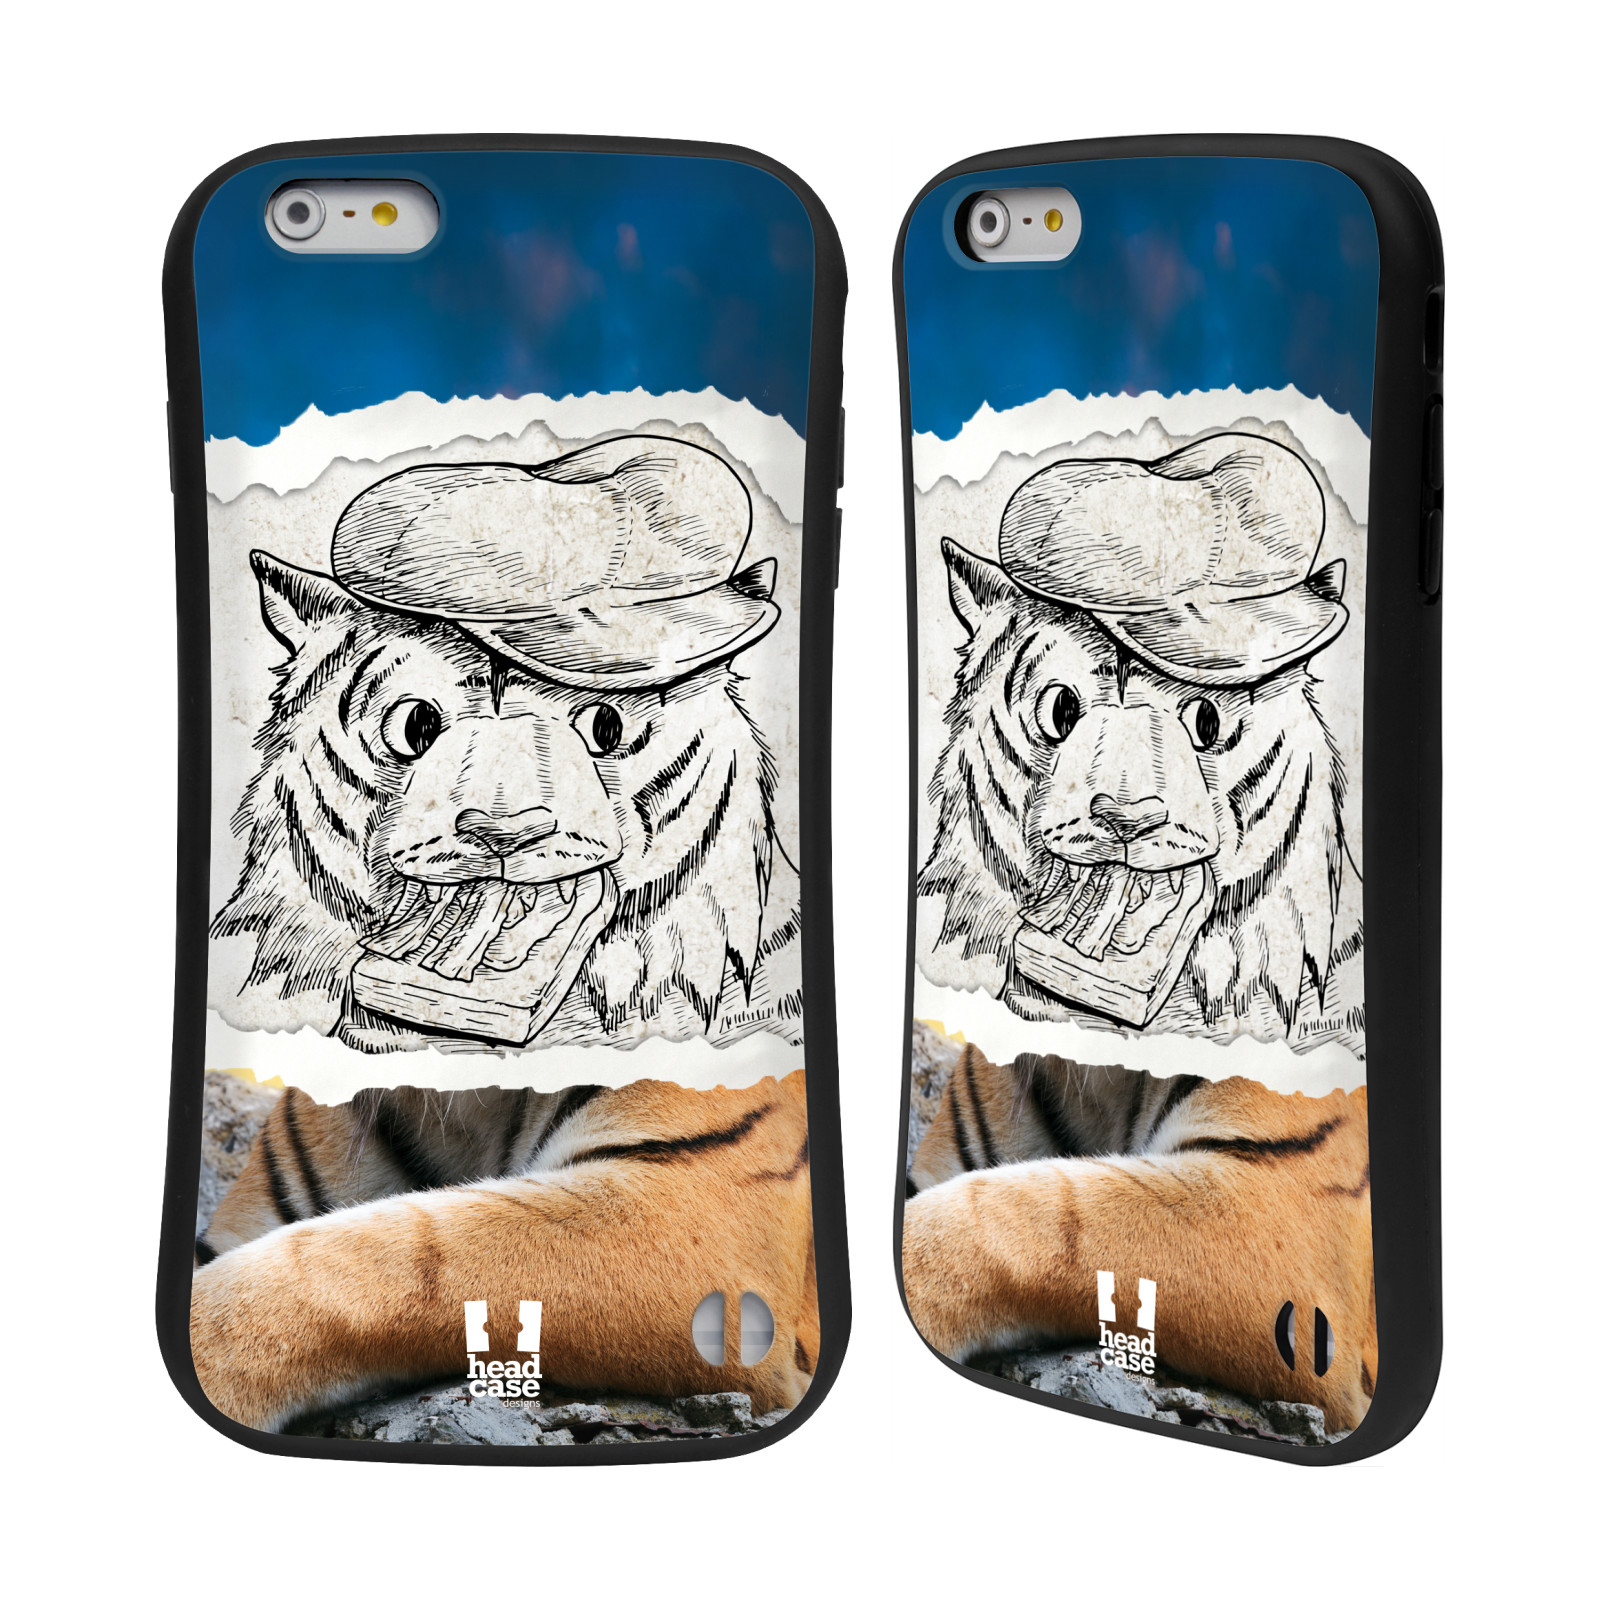 HEAD CASE silikon/plast odolný obal na mobil Apple Iphone 6 PLUS / 6S PLUS vzor zvířata koláž tygr fešák